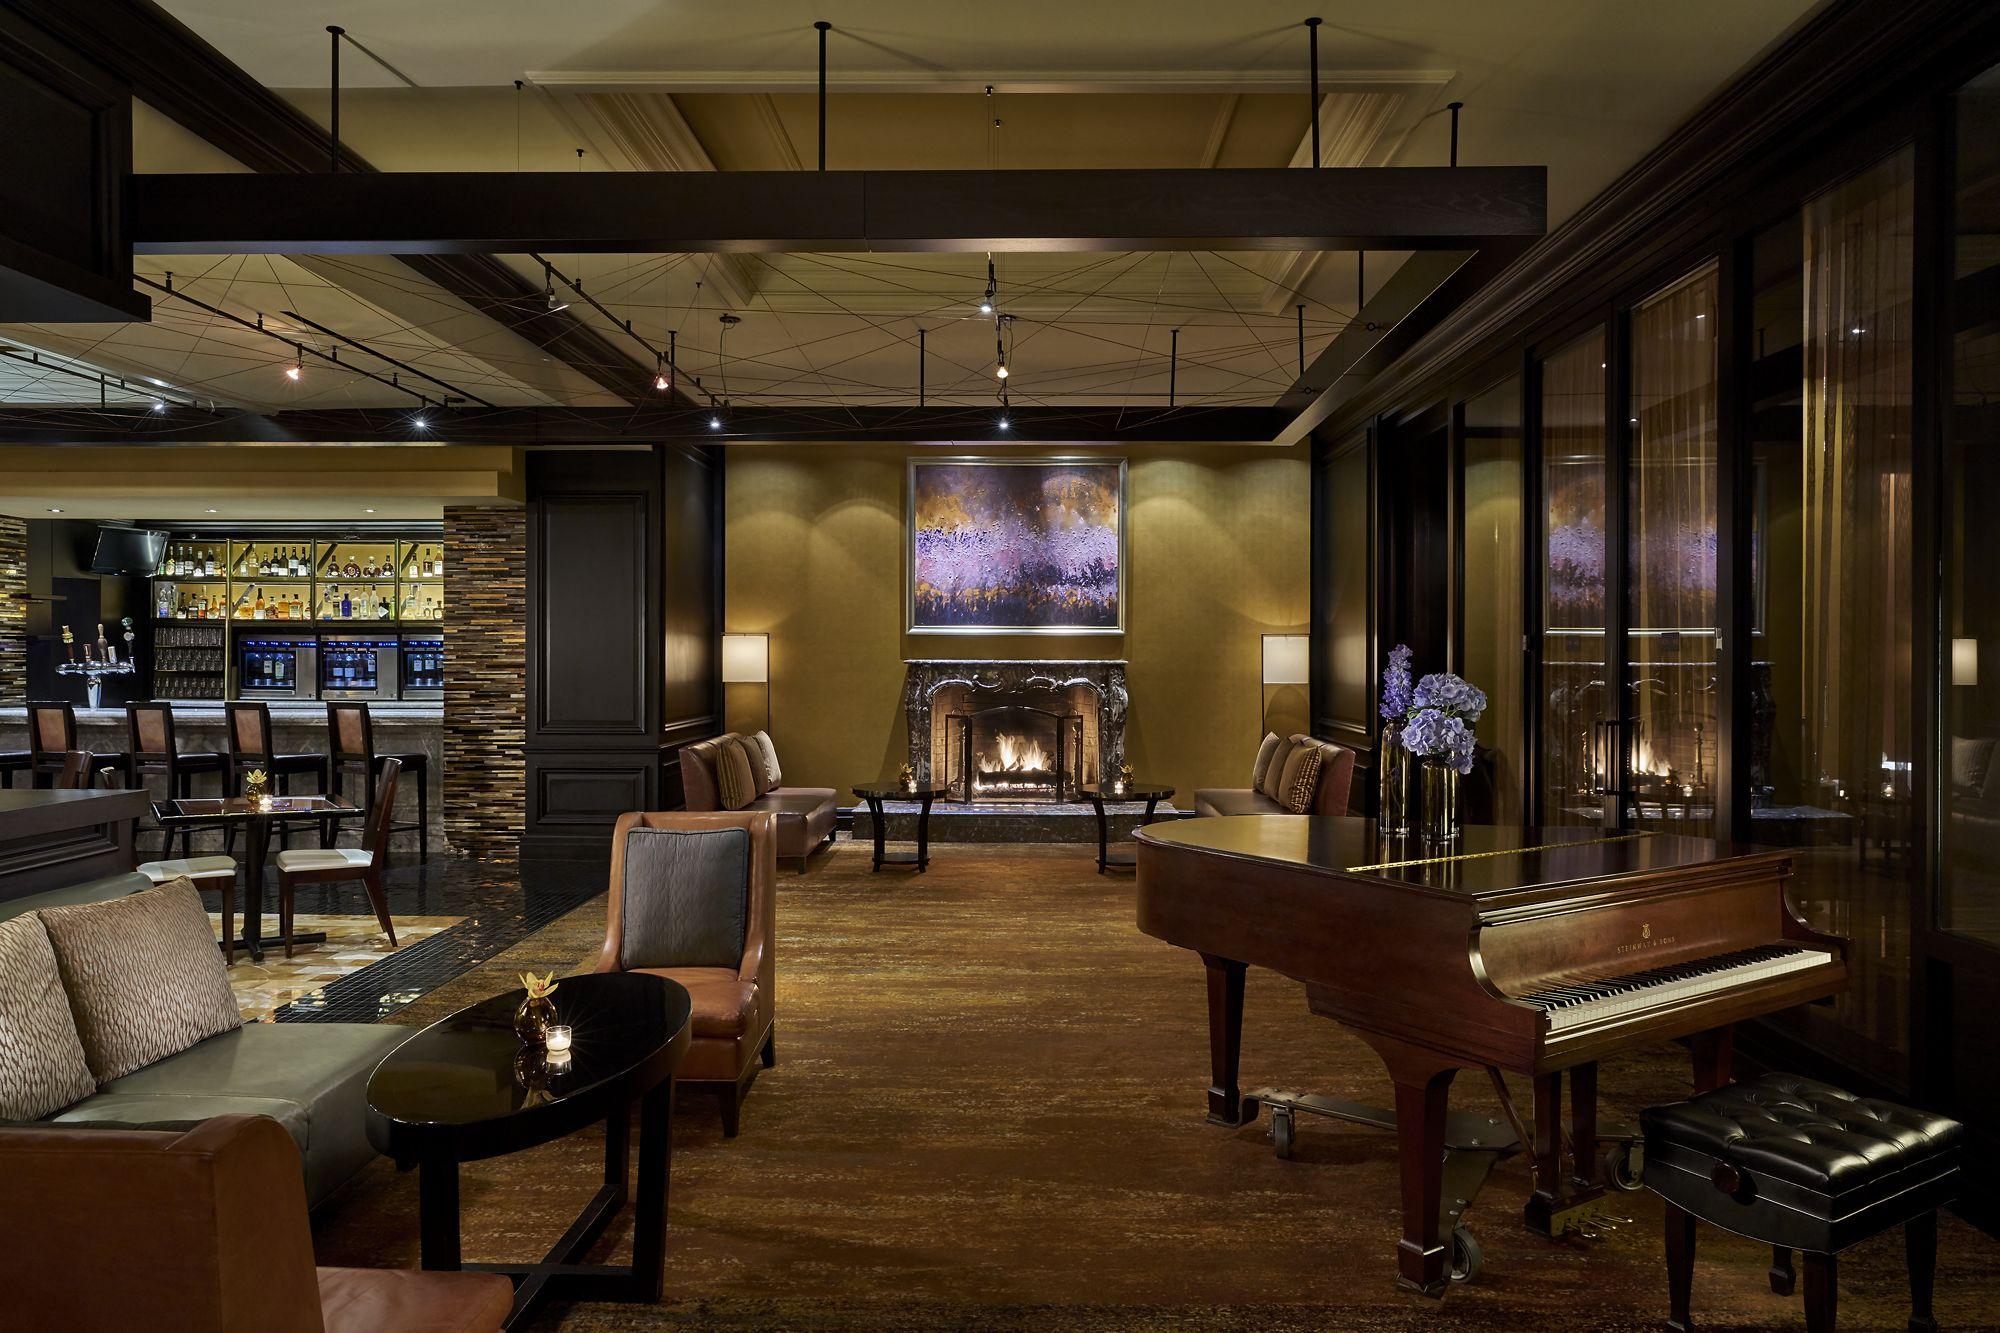 ENTYSE Wine Bar & Lounge - McLean, VA 22102 - (703)506-4300 | ShowMeLocal.com